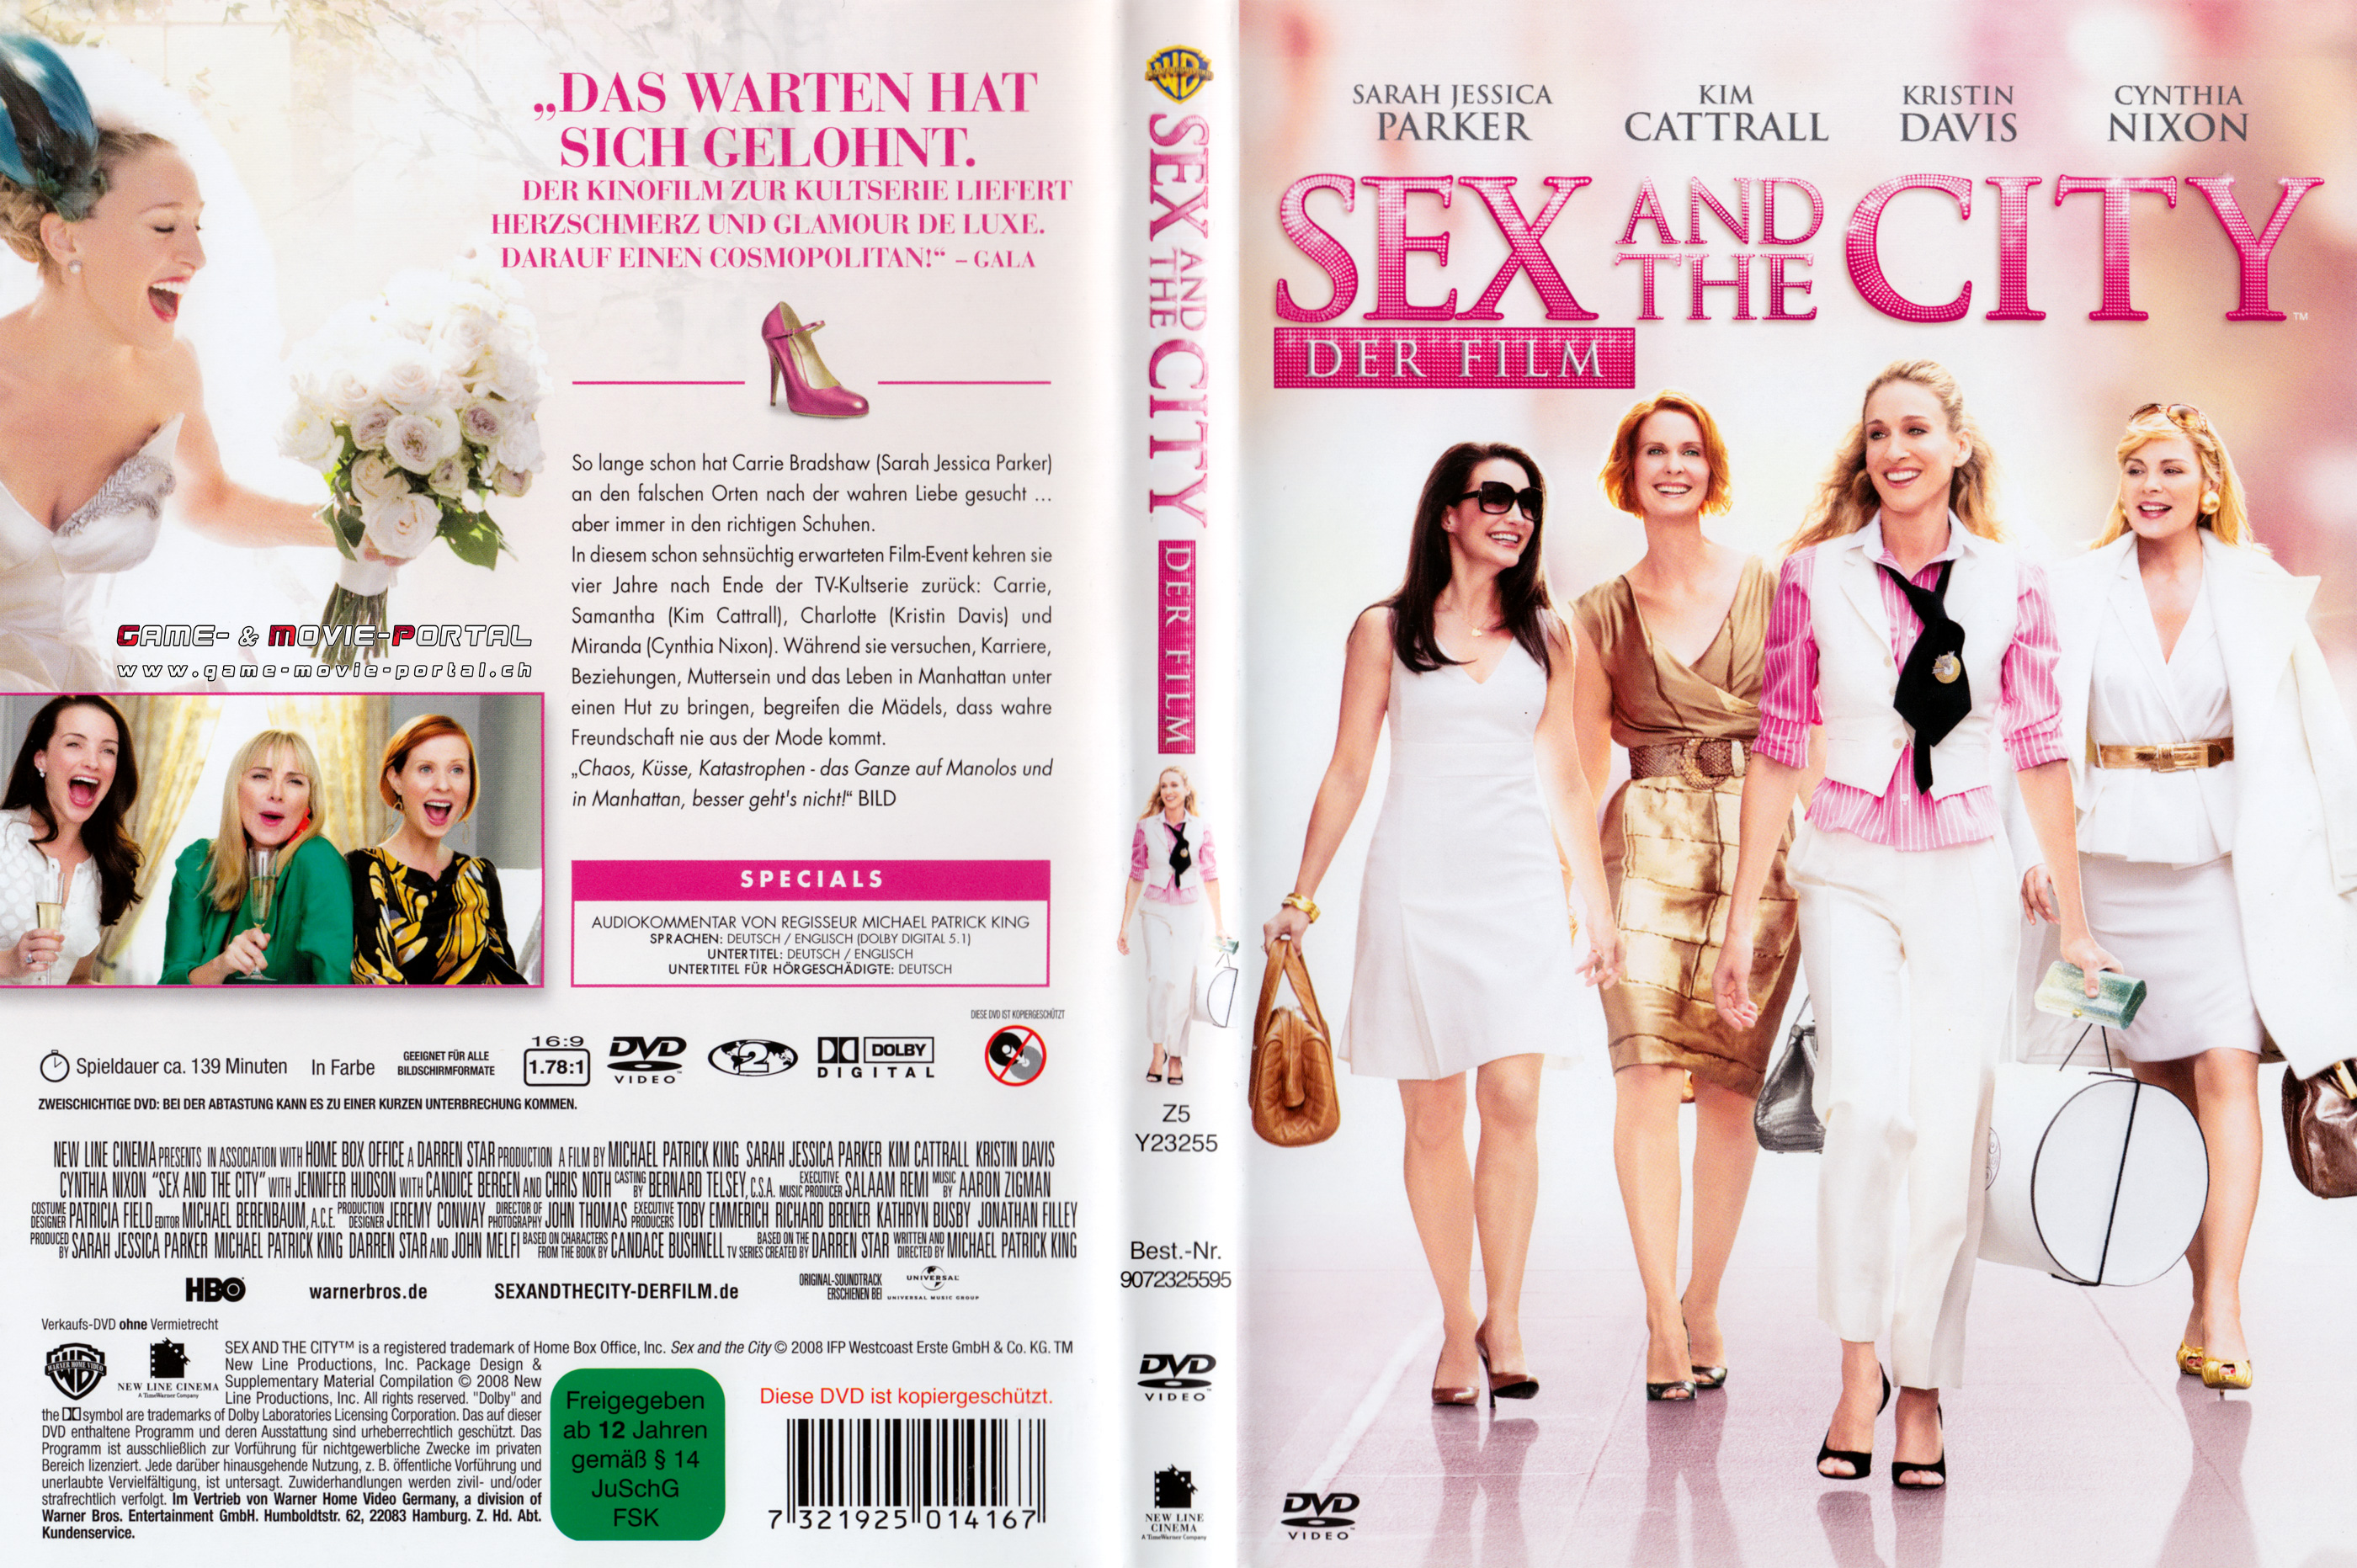 erwachsene billig dvd film